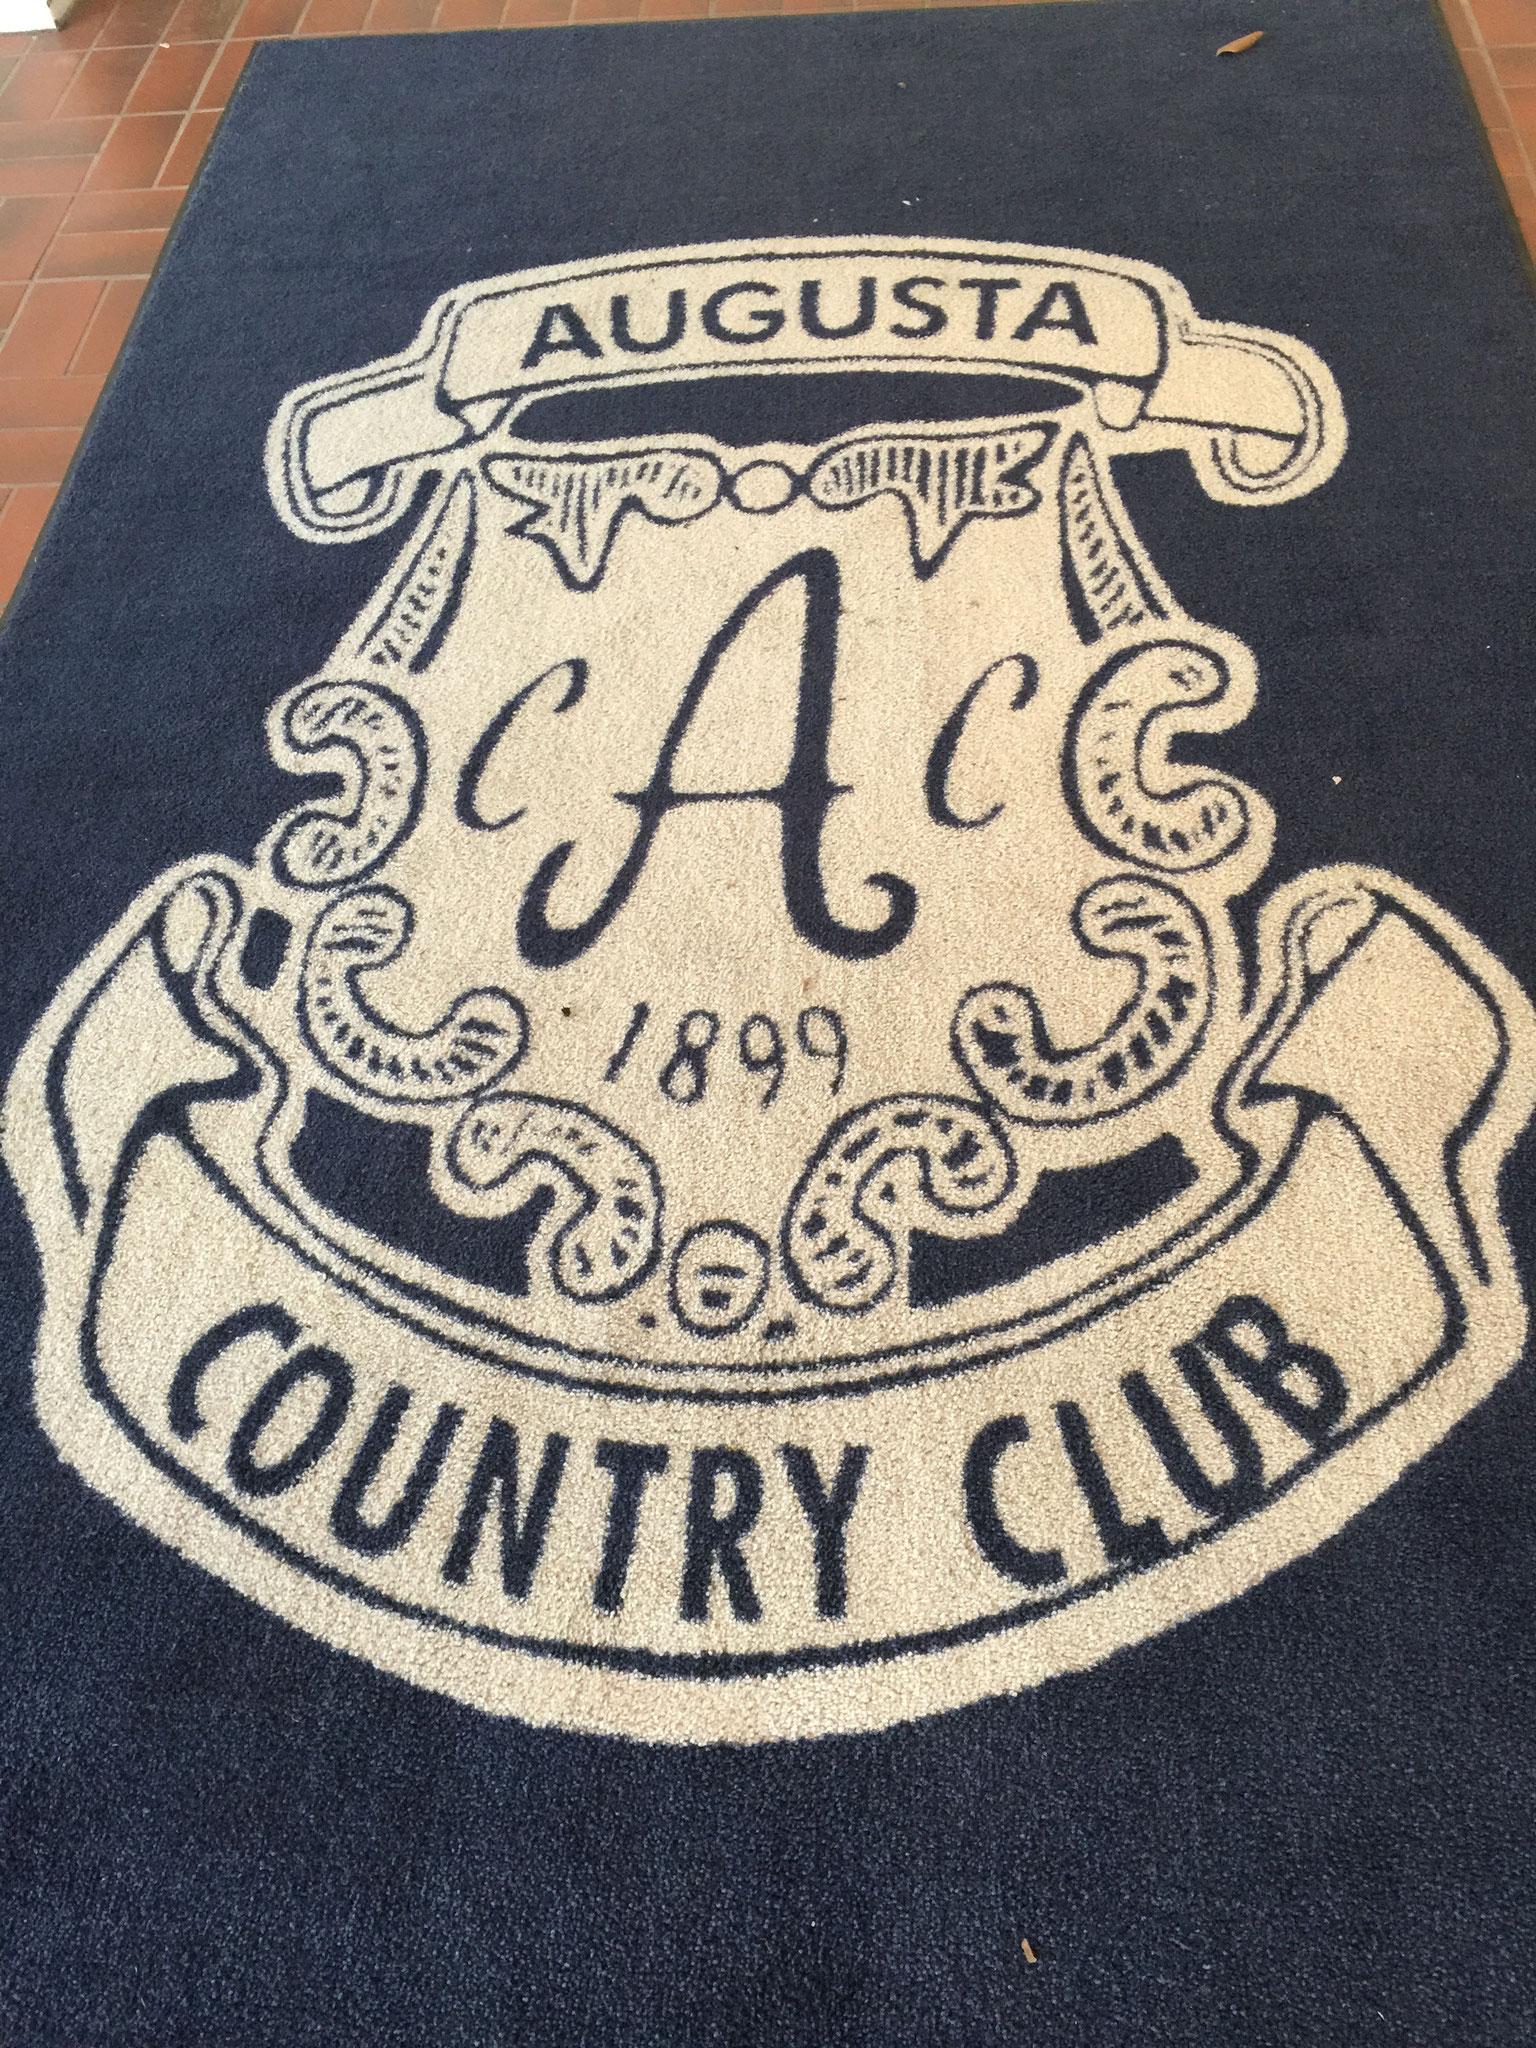 Augusta Georgia Feb 2019